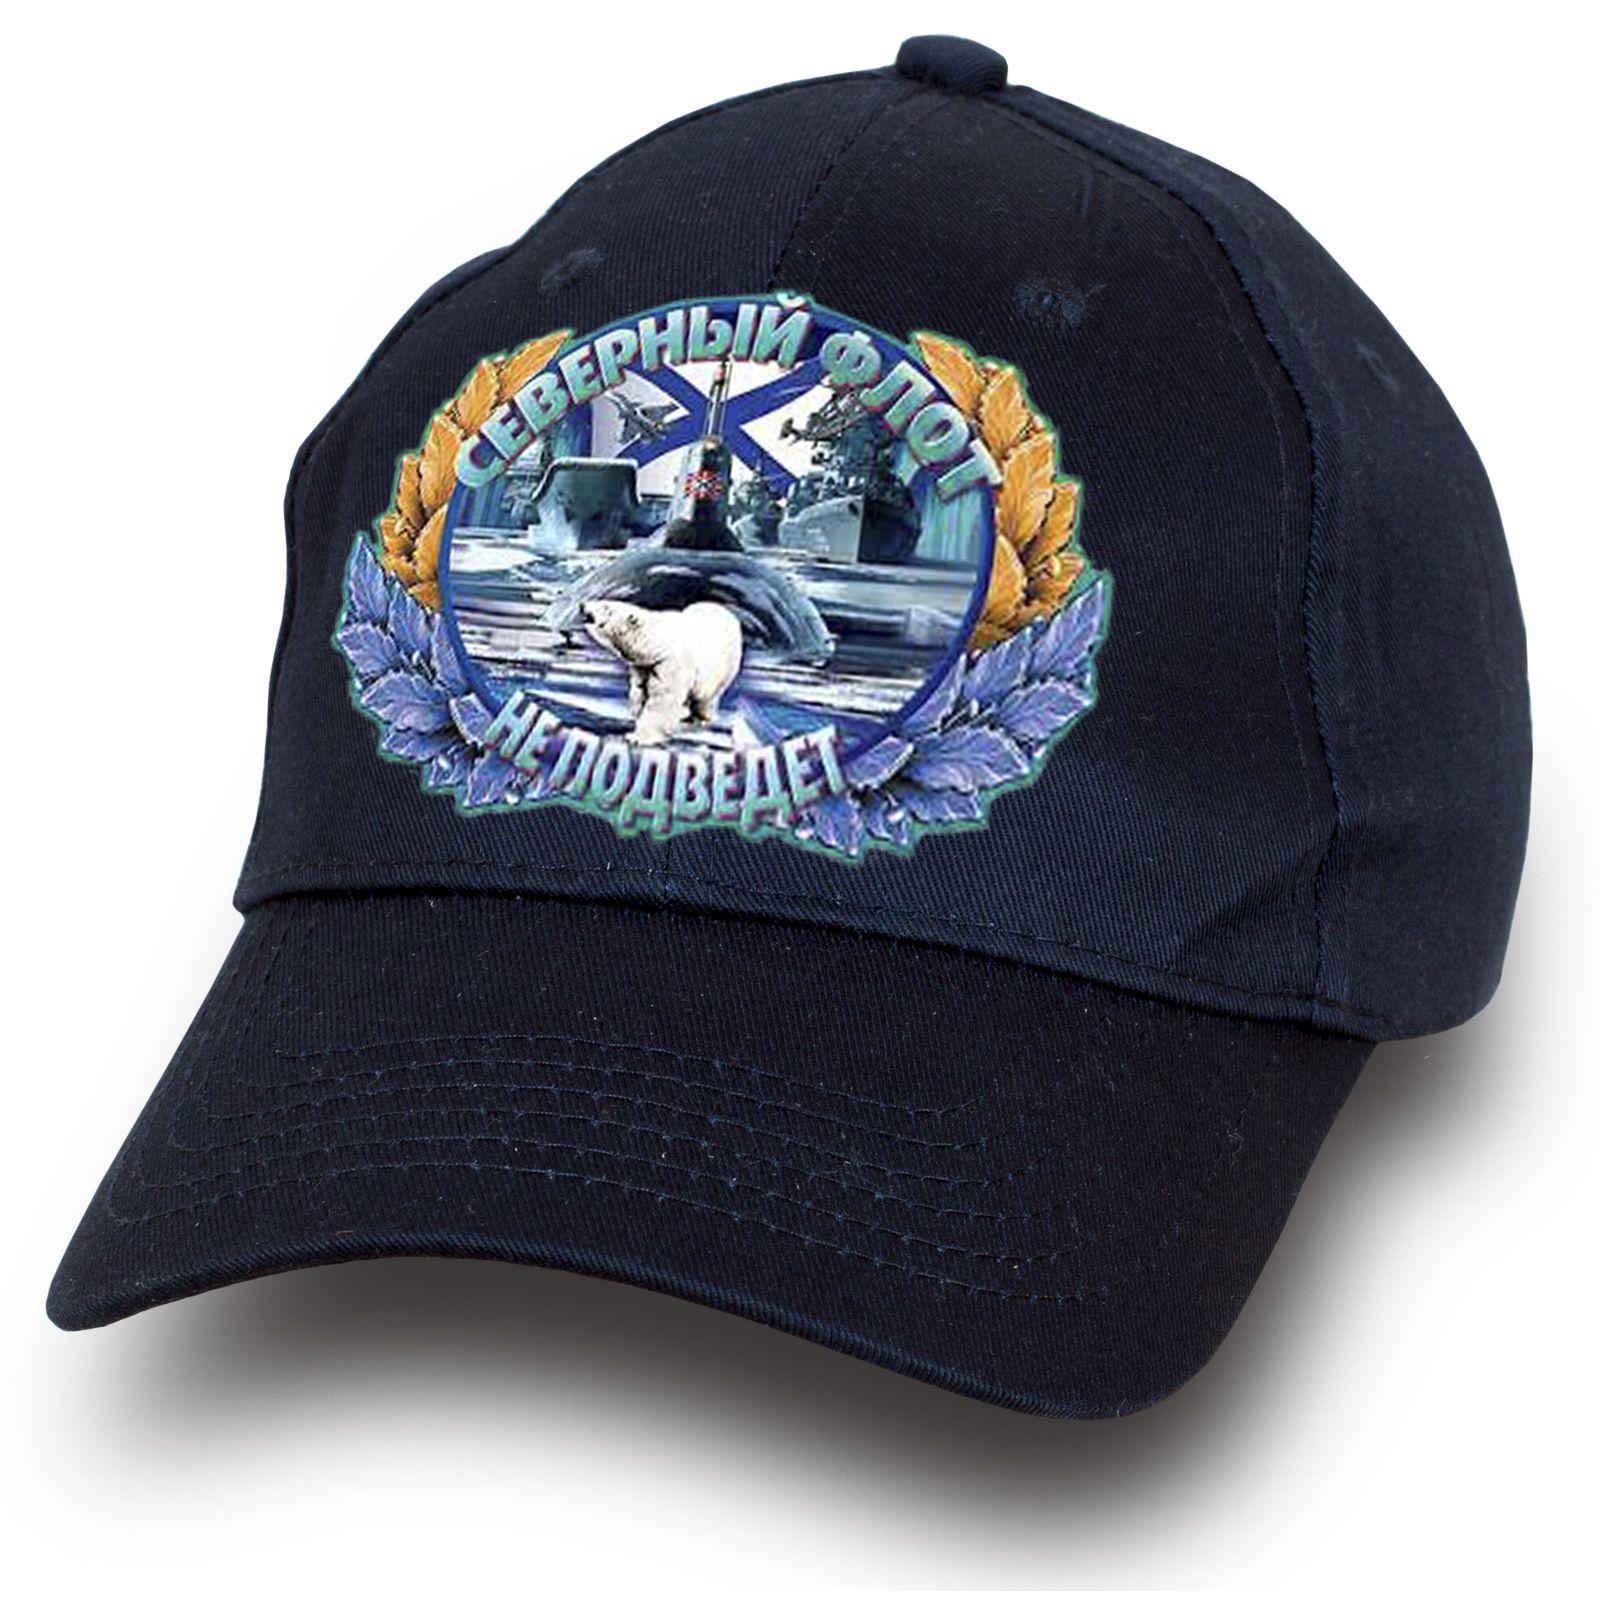 Бейсболка моряка-североморца - заказать оптом